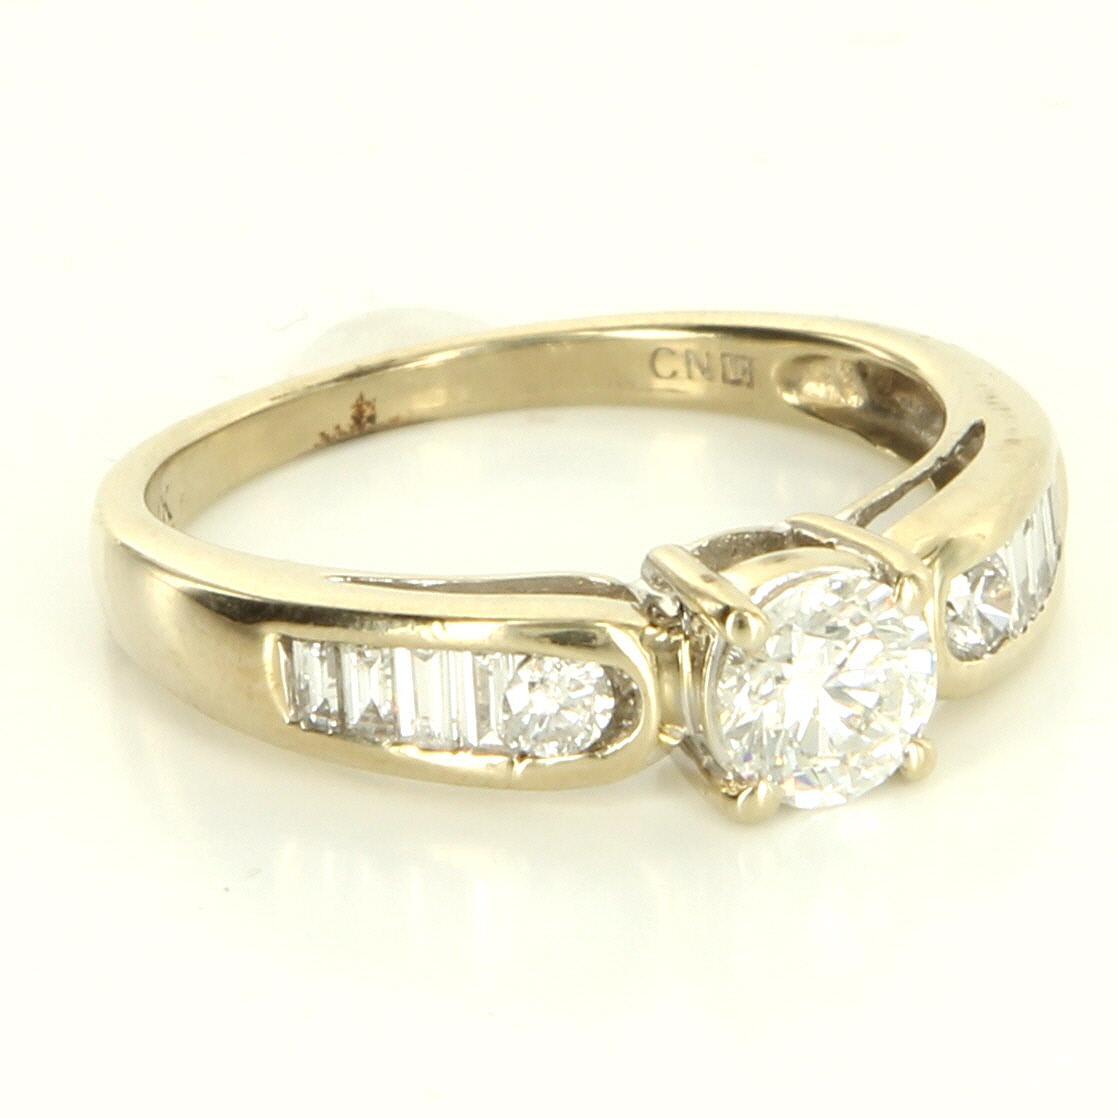 Vintage 14 Karat White Gold Diamond Engagement Ring Fine Bridal Jewelry Estate